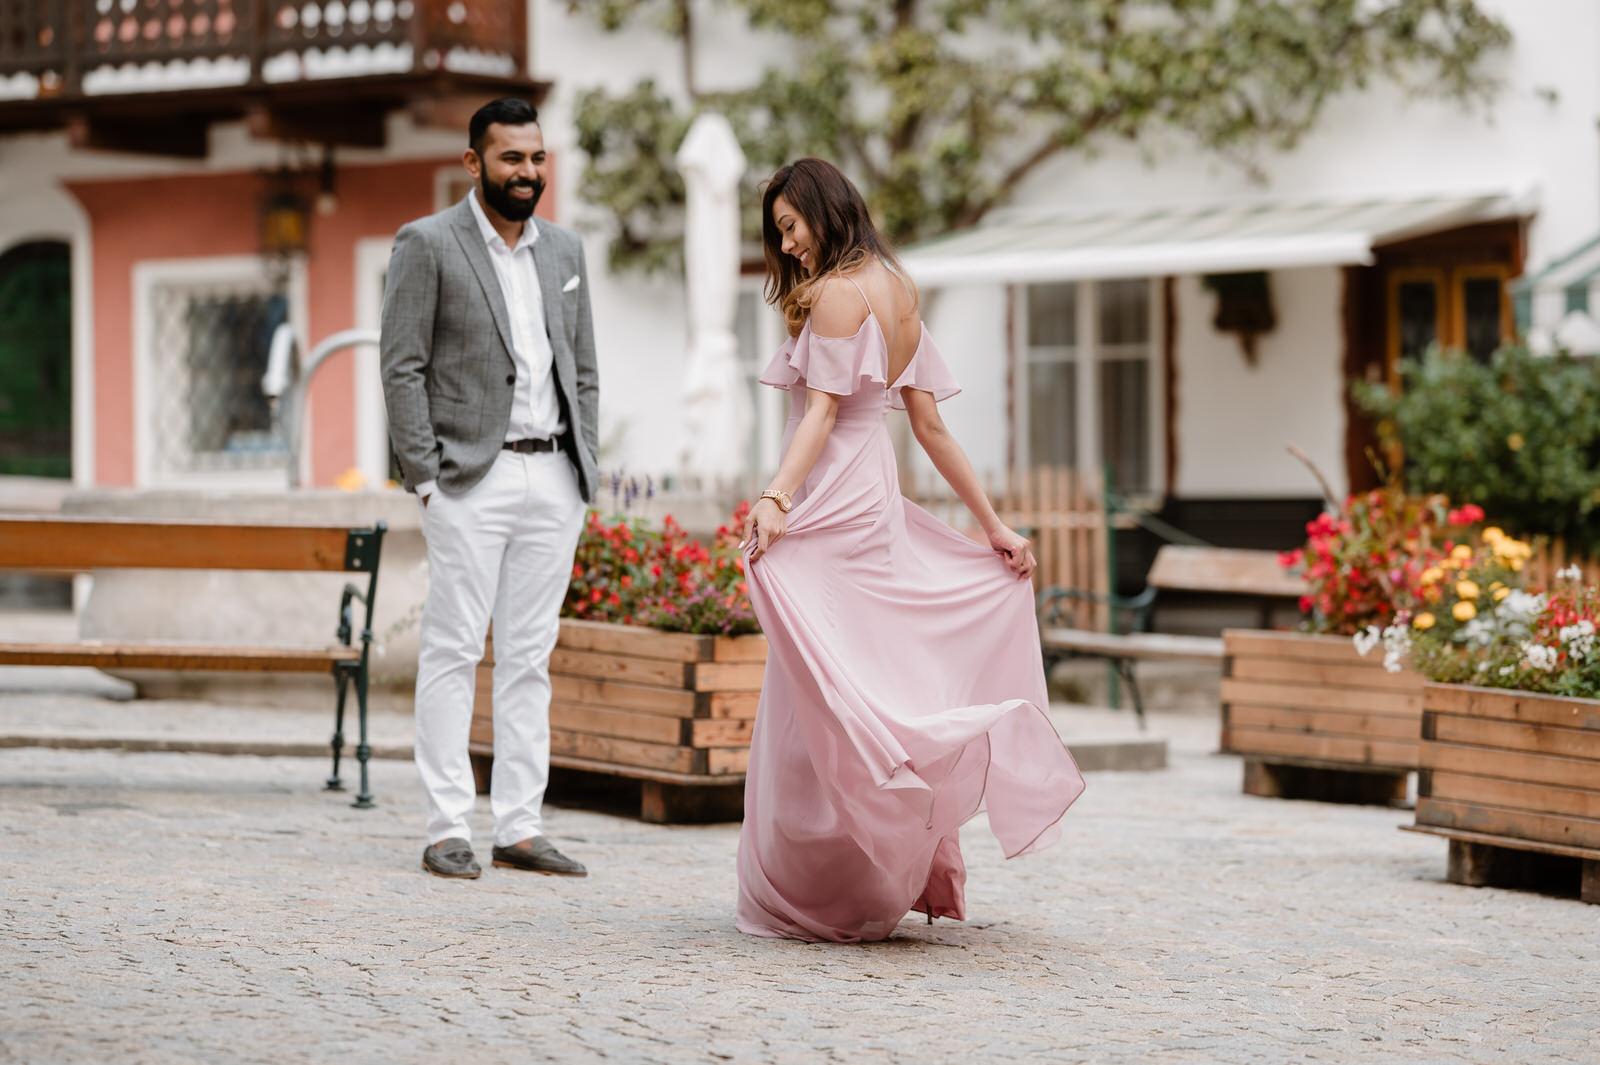 Visha waving the dress in front of her boyfriend